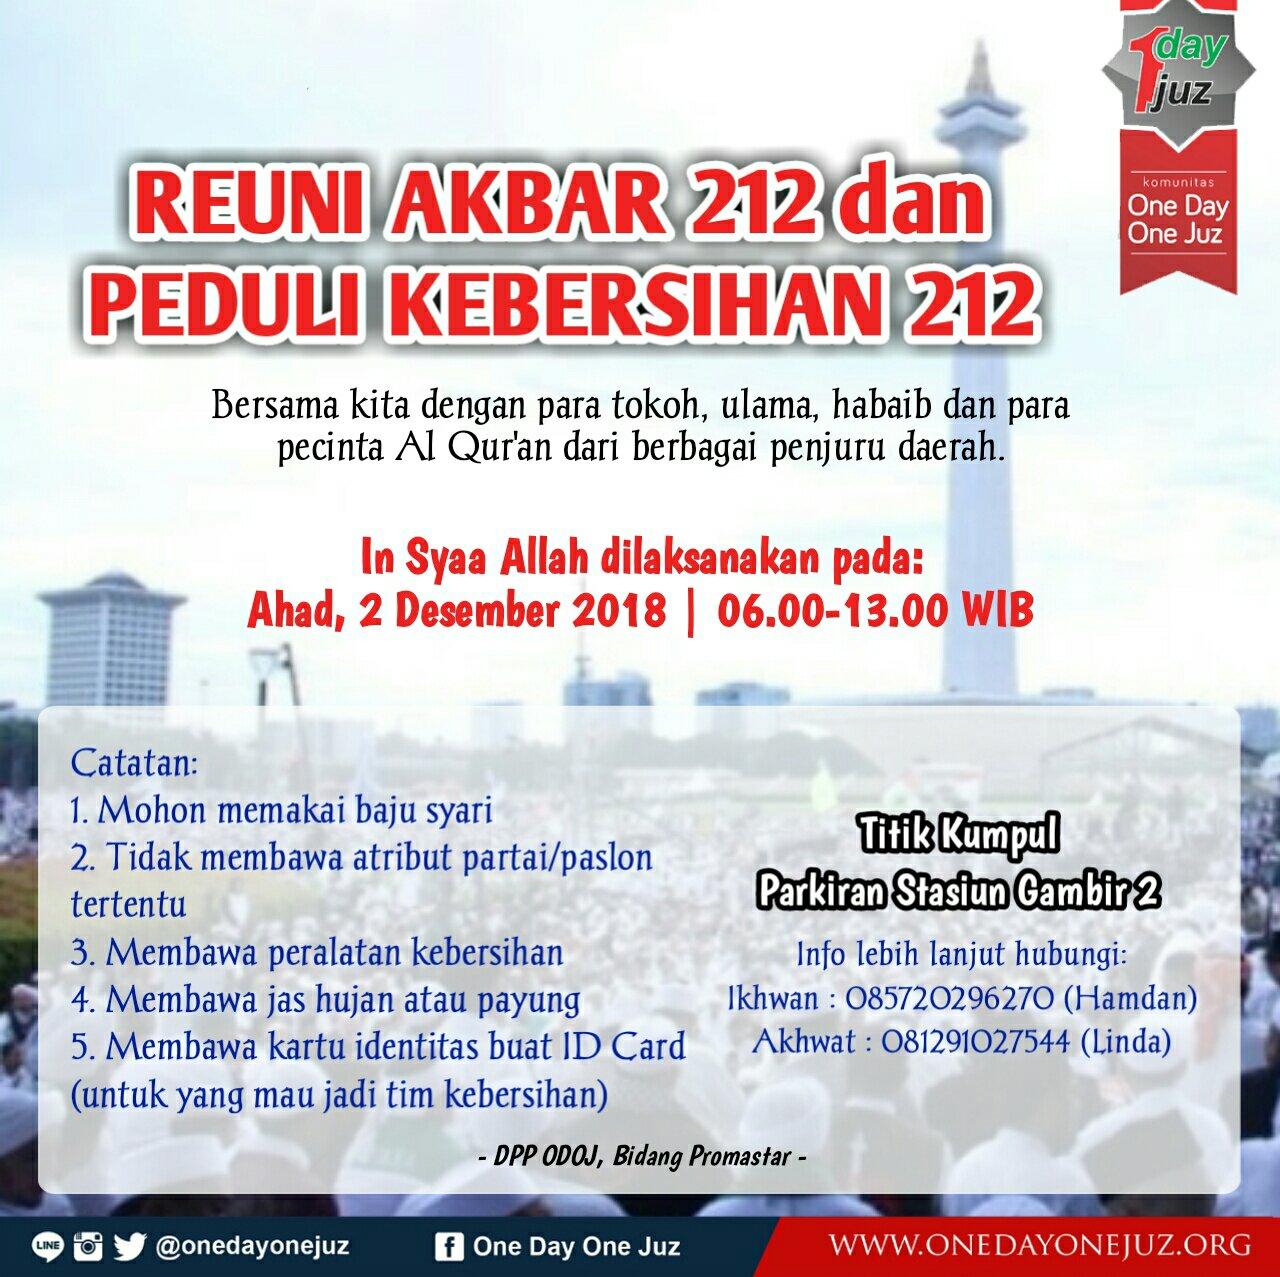 Reuni Akbar 212 Dan Peduli Kebersihan 212 Odoj Jawa Barat